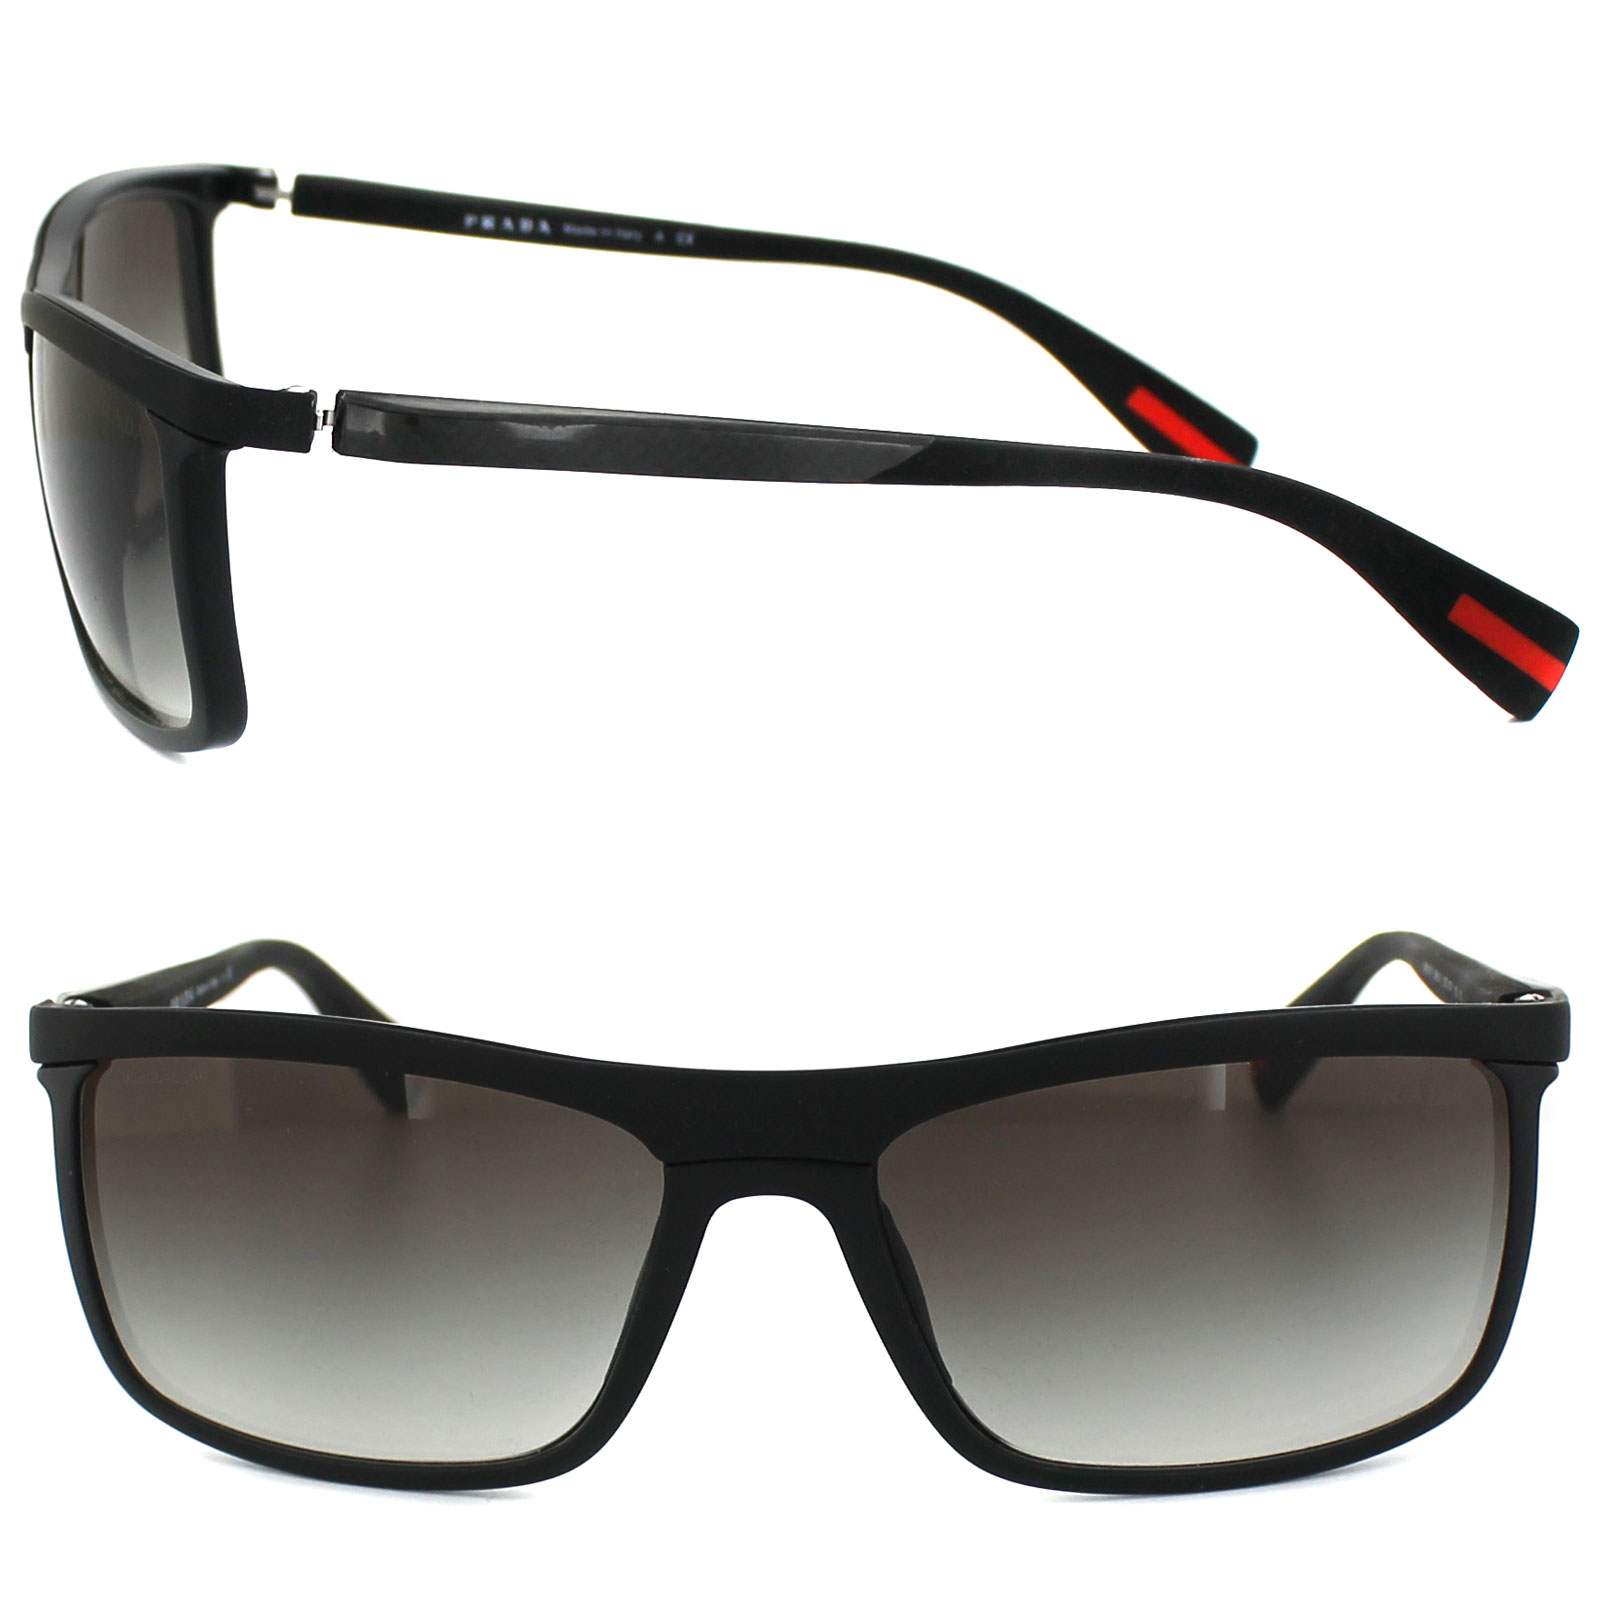 41b14234b0d86 ... best sentinel prada sport sunglasses 51ps 1bo0a7 black grey gradient  47eba 07c29